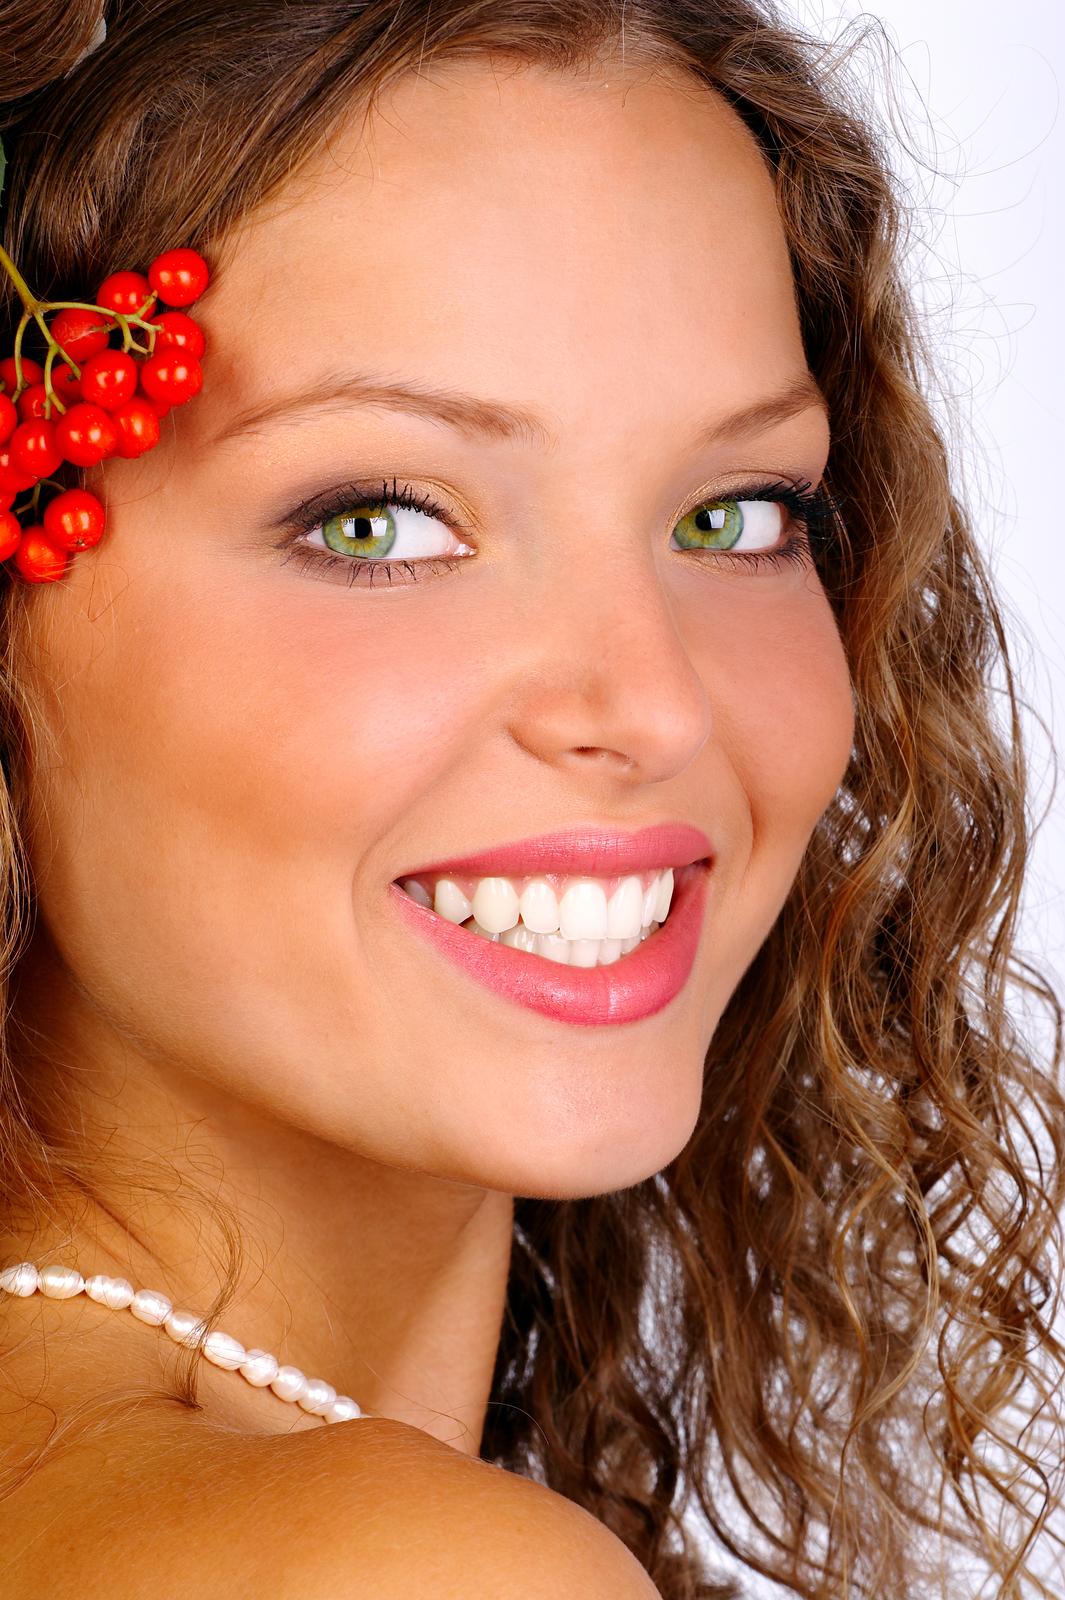 Peterborough Periodontist, Peterborough Dentists, Best Dental Implants Toronto, Kawarthas Dentists, Dental Implants, Dental Healthy, Missing Teeth,